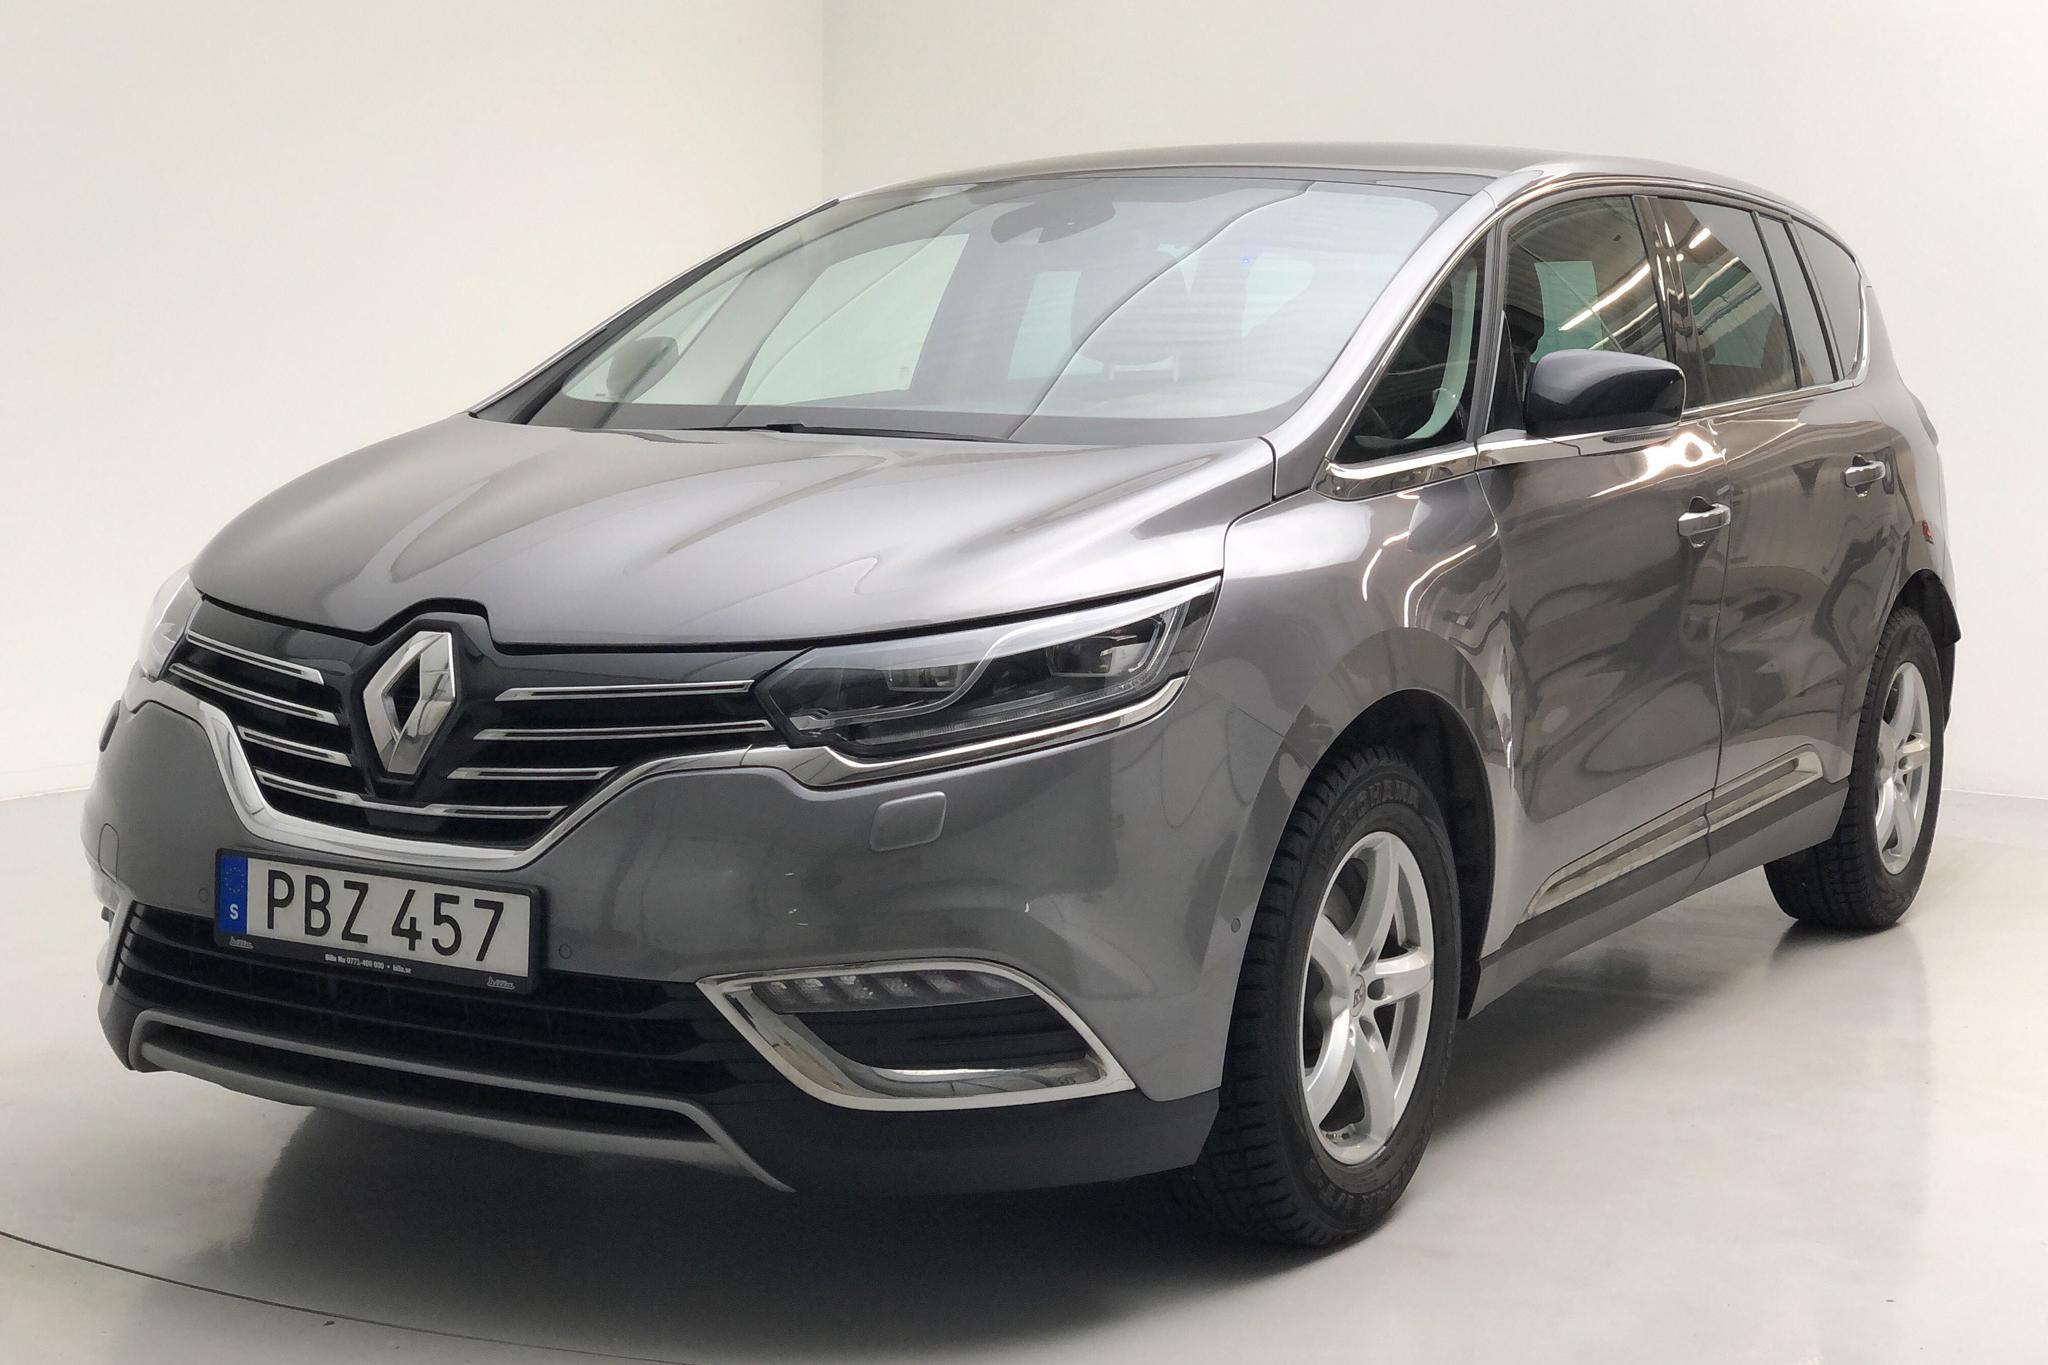 Renault Espace 1.6 dCi (160hk) - 100 030 km - Automatic - gray - 2017